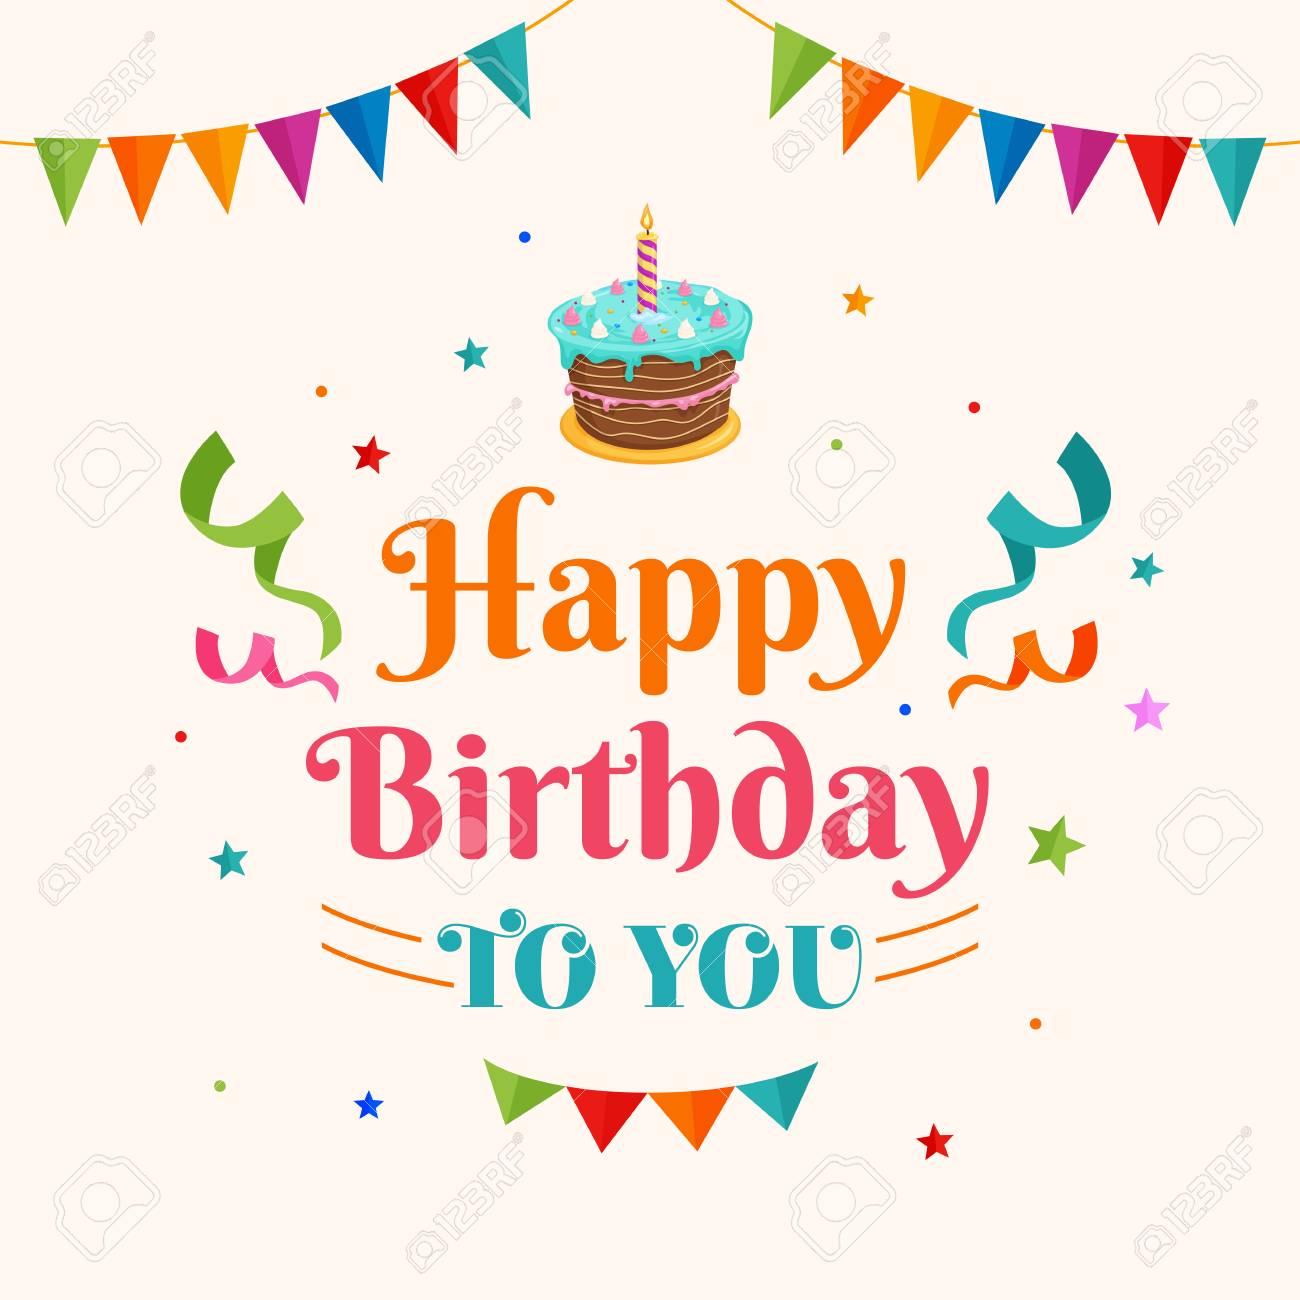 Happy Birthday To You.Happy Birthday To You Background Vector Birthday Cake Illustration